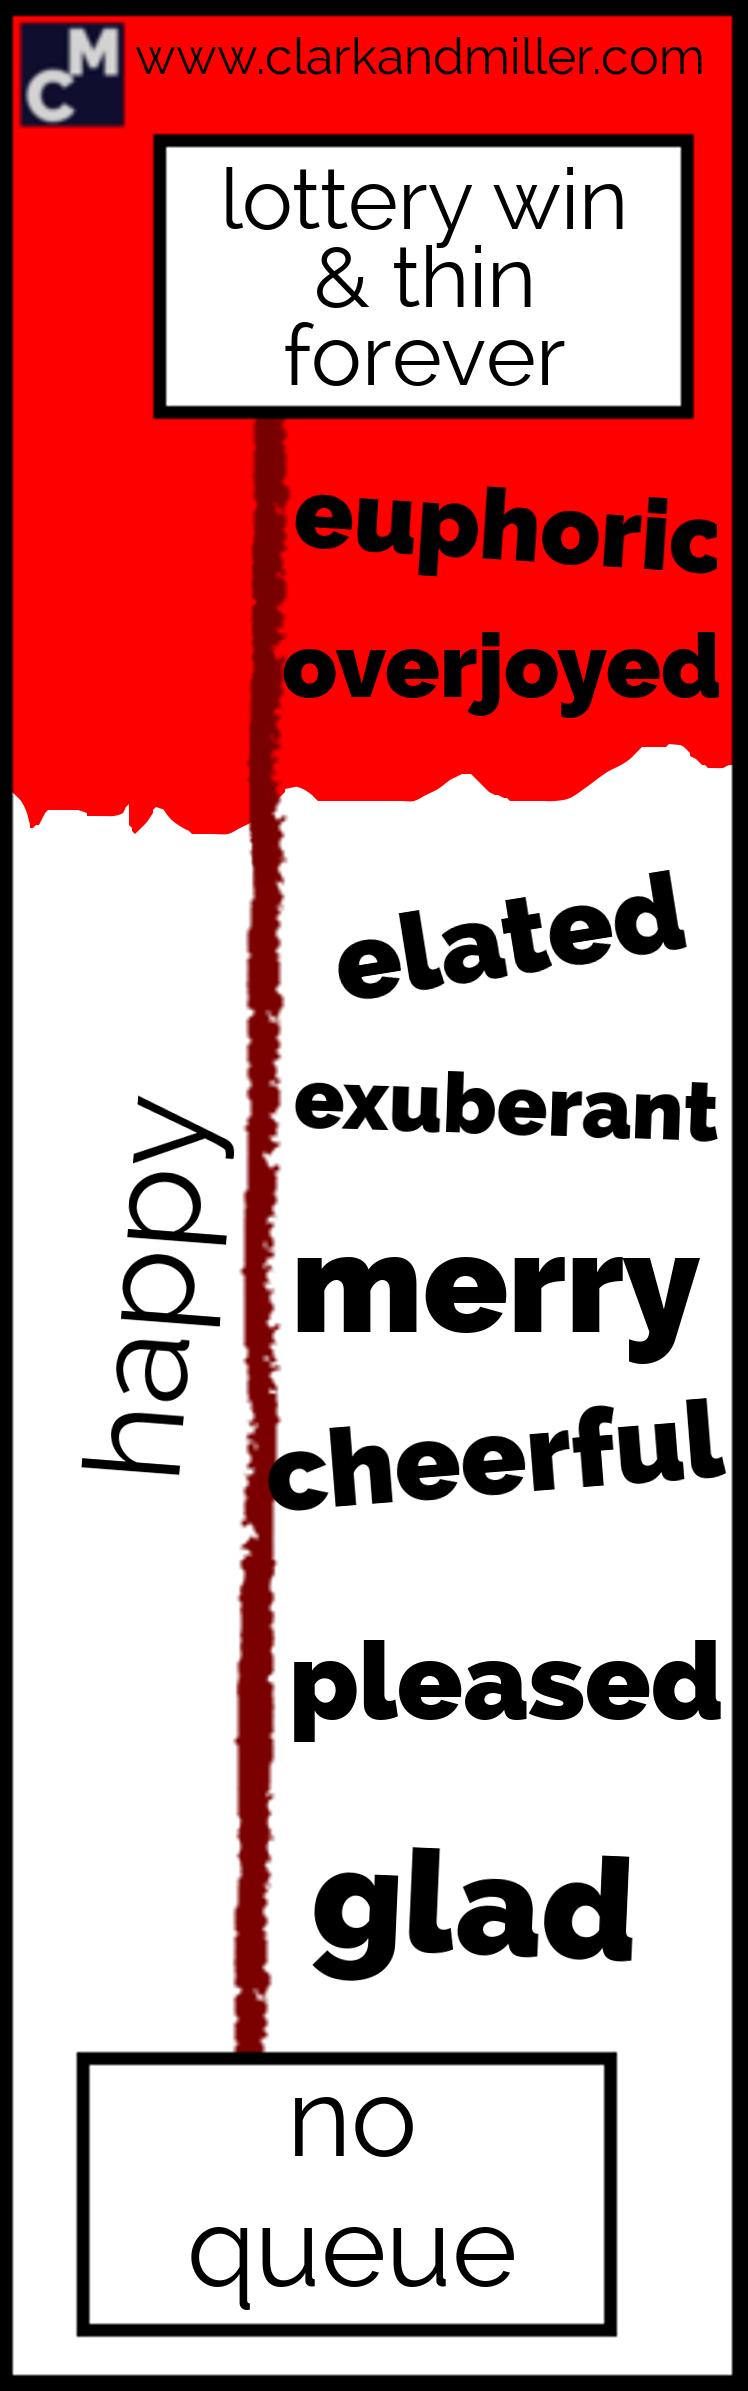 Words for happy: euphoric, overjoyed, elated, exuberant, merry, cheerful, pleased, glad